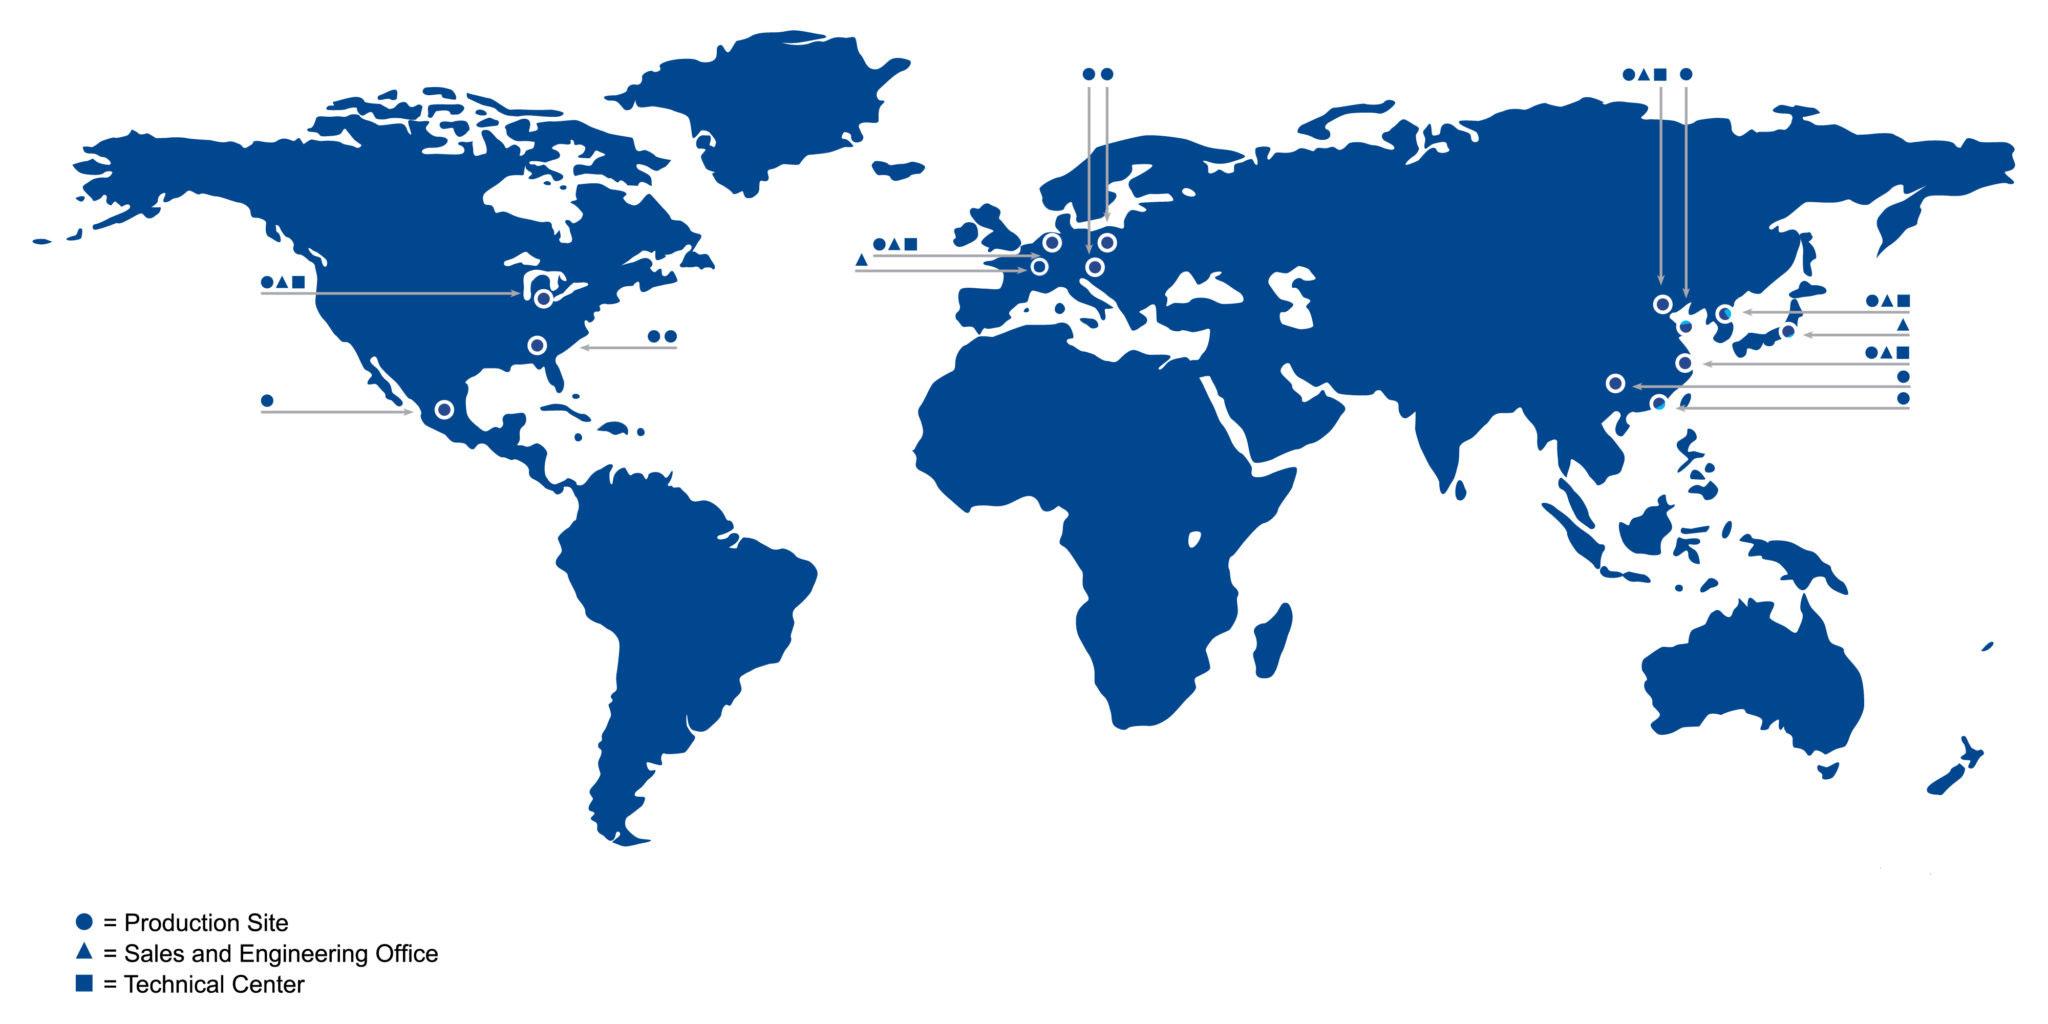 Inalfa global presence